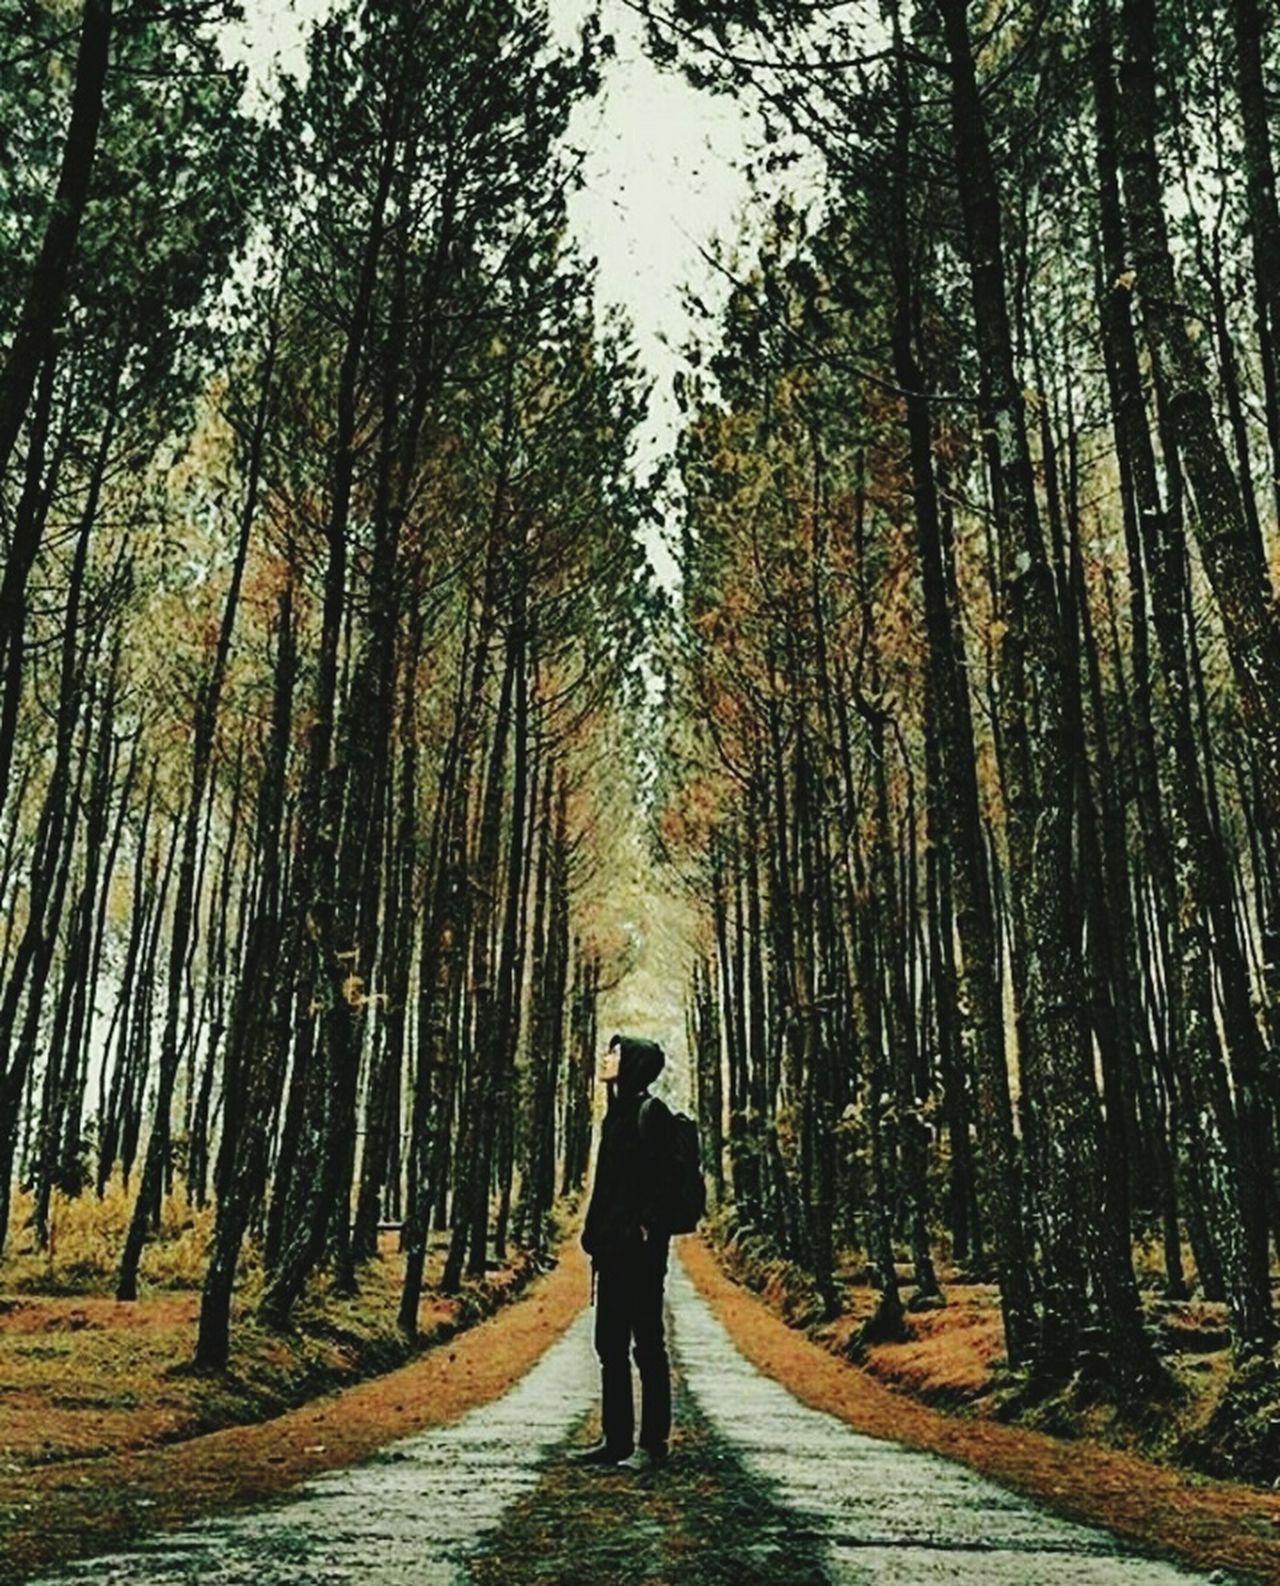 Check This Out Hanging Out That's Me Explore ExploreEverything Hi! Relaxing Magelang Ayokemagelang Jawatengah Exploring Trees